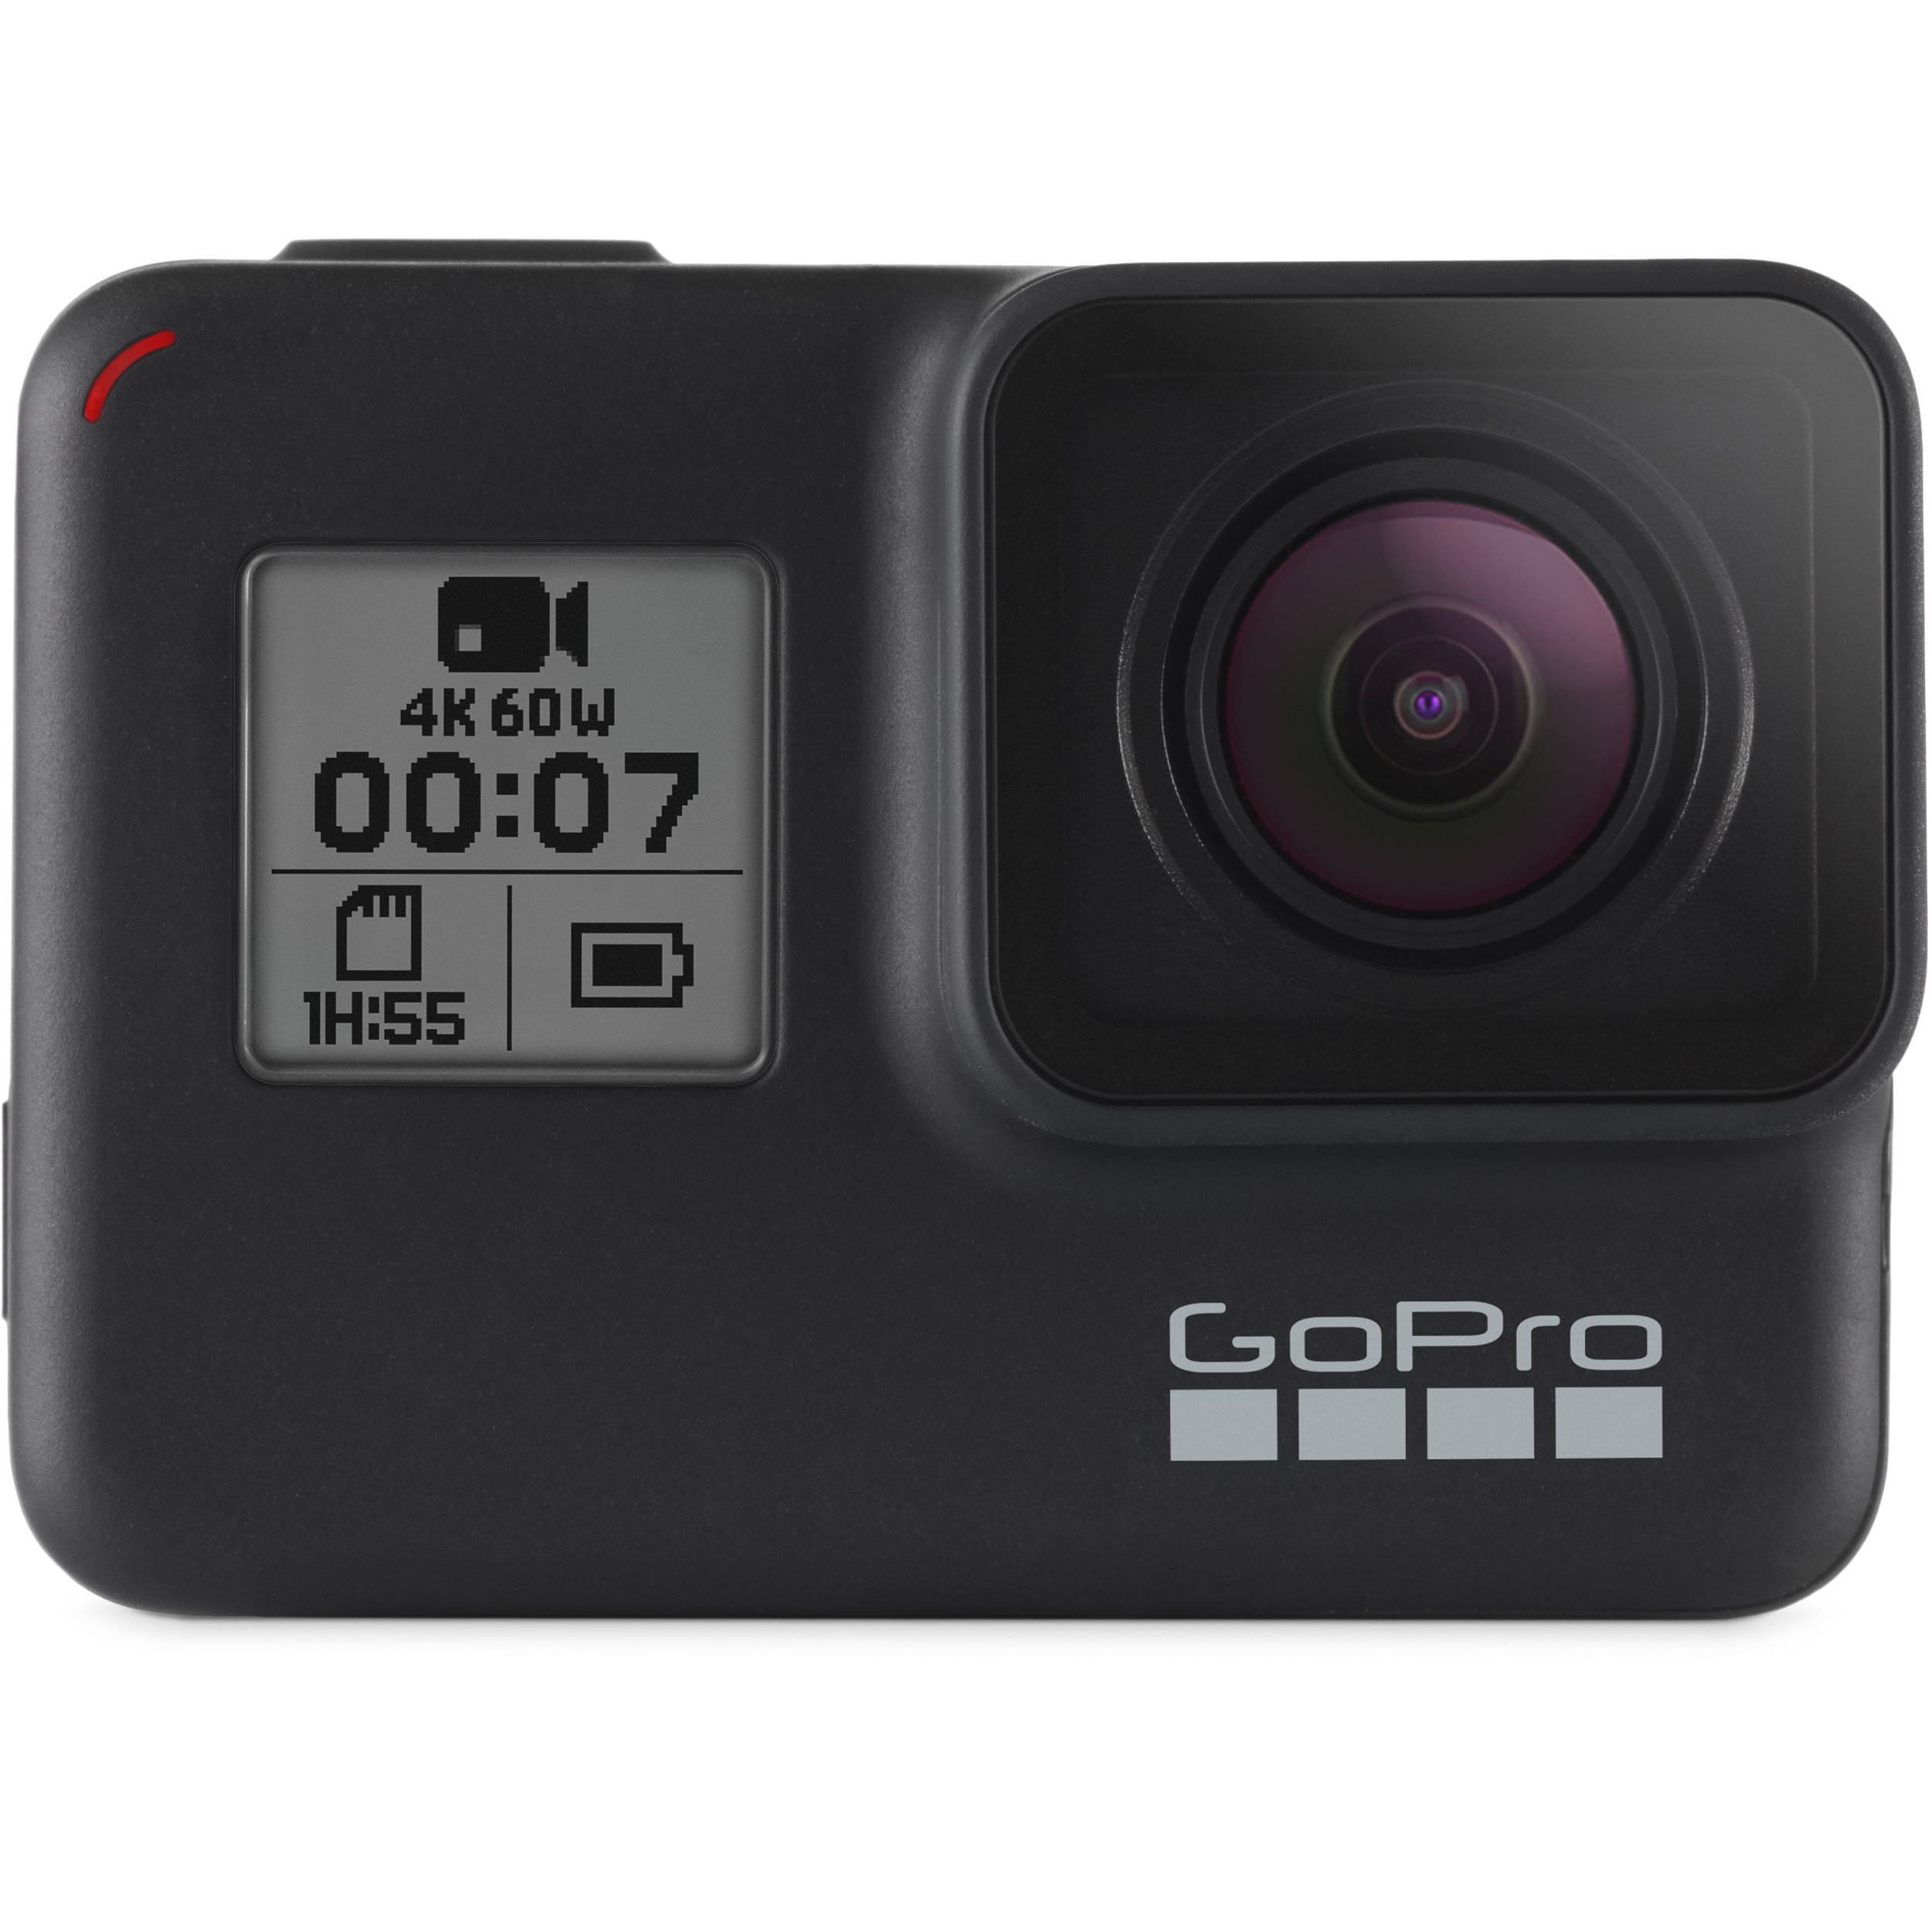 605cbf86a4d GoPro Hero 7 Black CHDHX-701 HERO7 B&H Photo